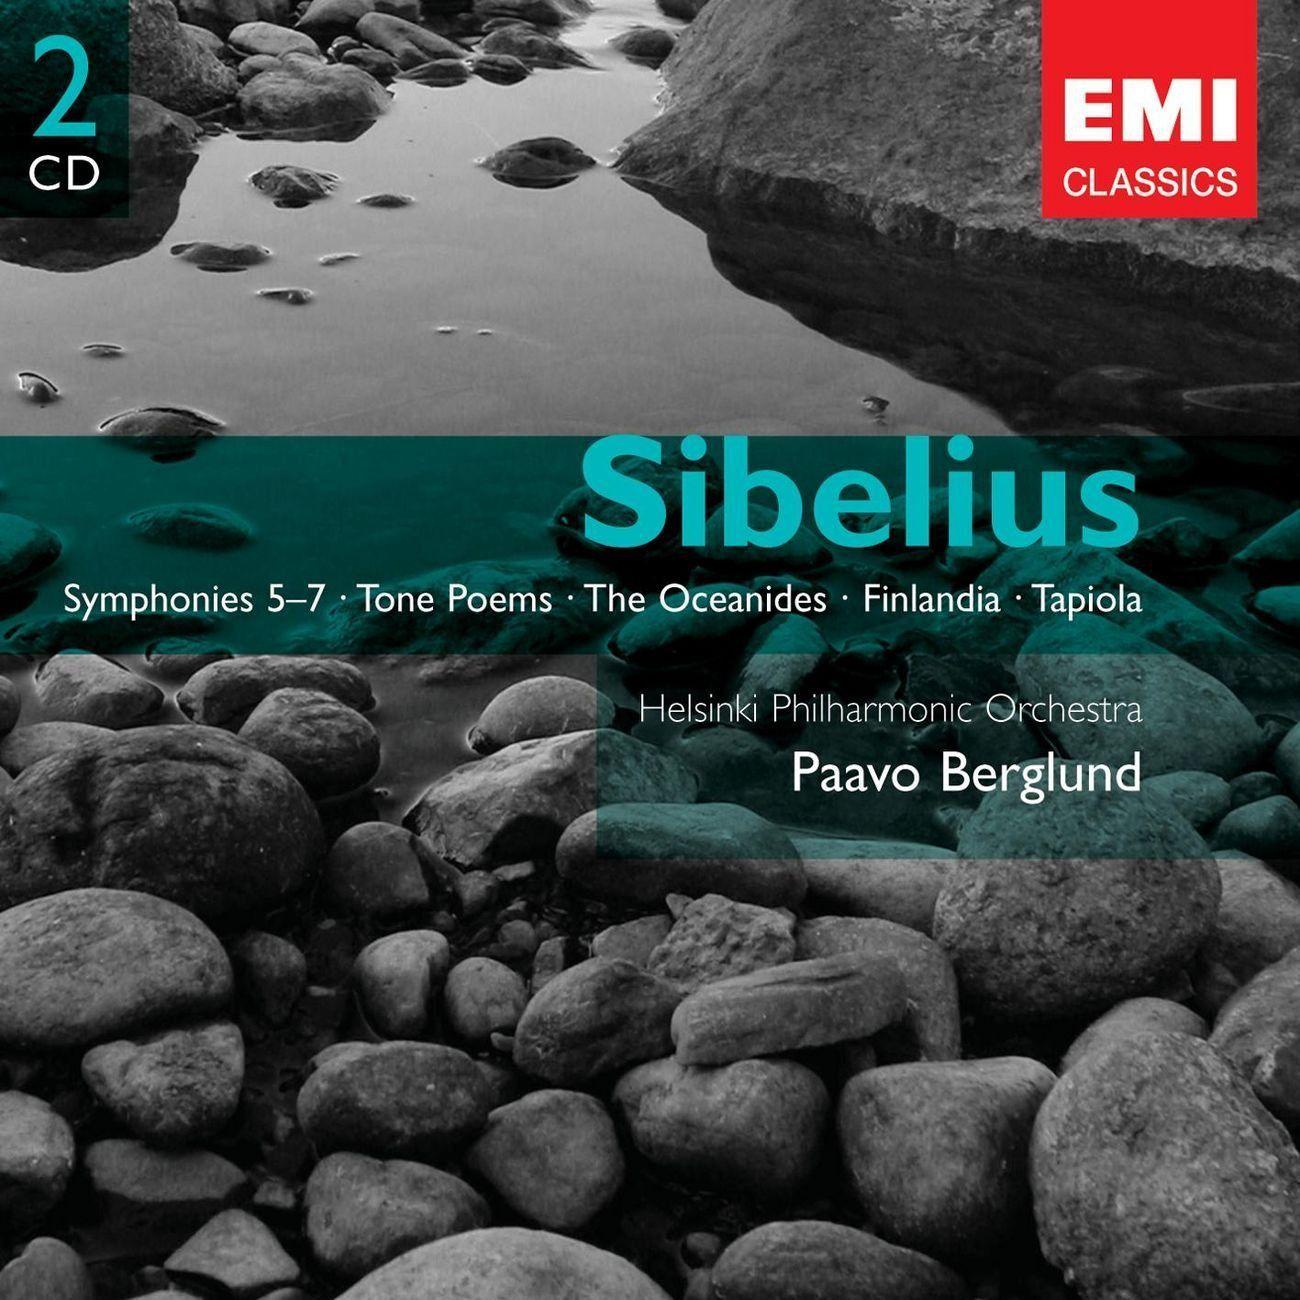 Helsinki Philharmonic Orchestra / Paavo Berglund // EMI Classics 4769512 - Recorded 1986